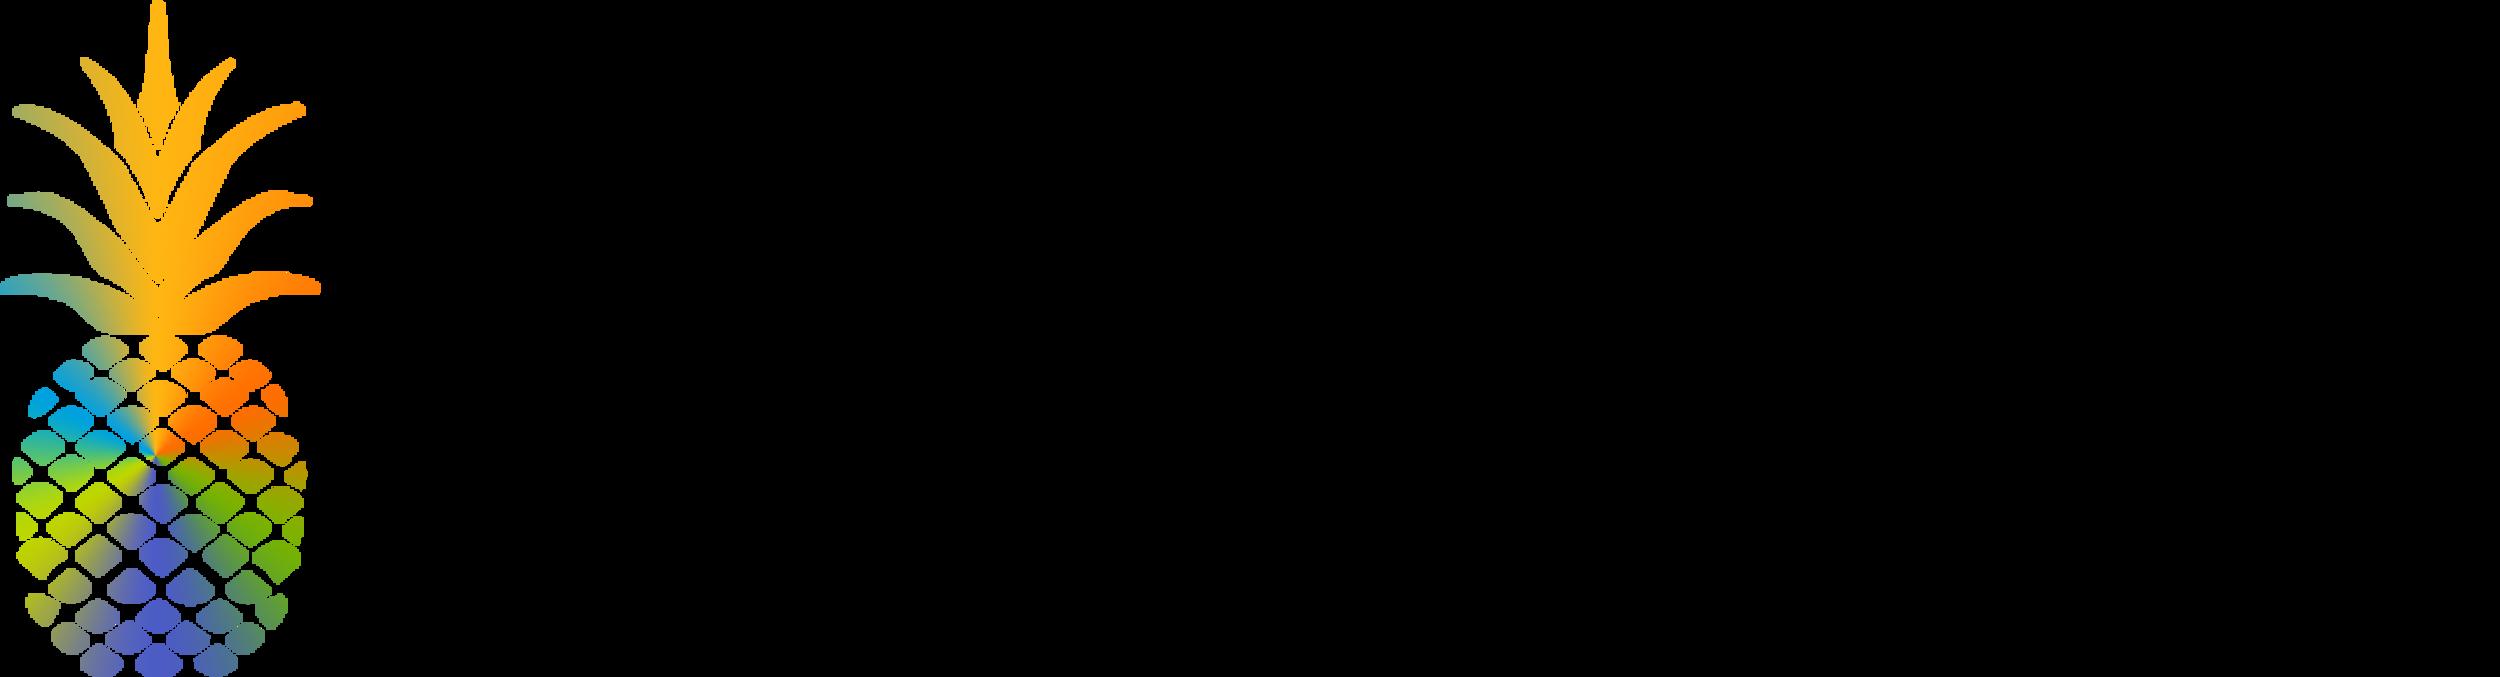 Wellness Pineapple logo.png